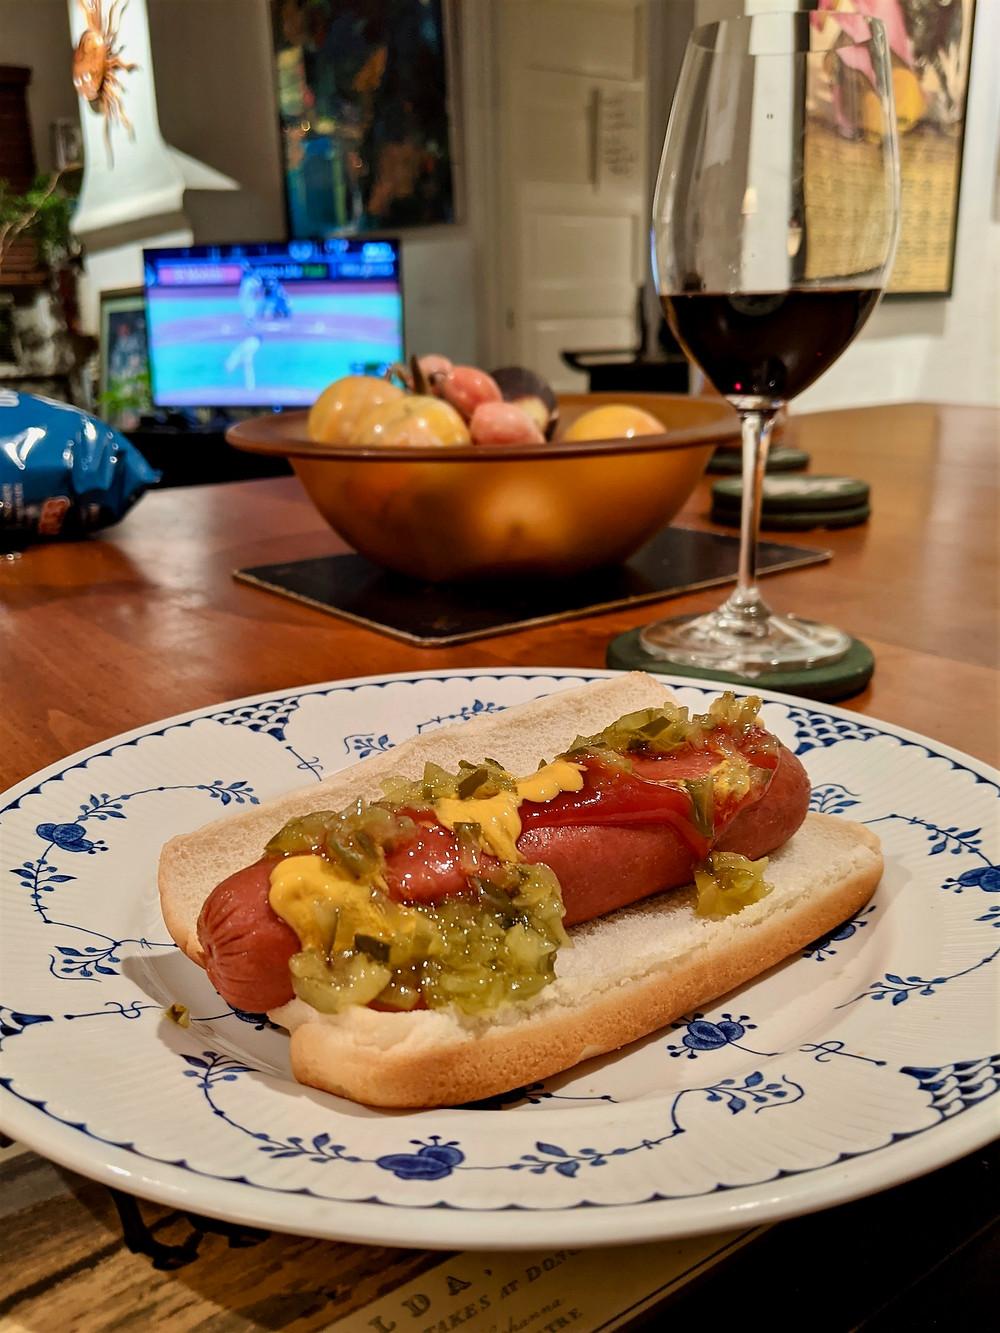 Hot dog and wine